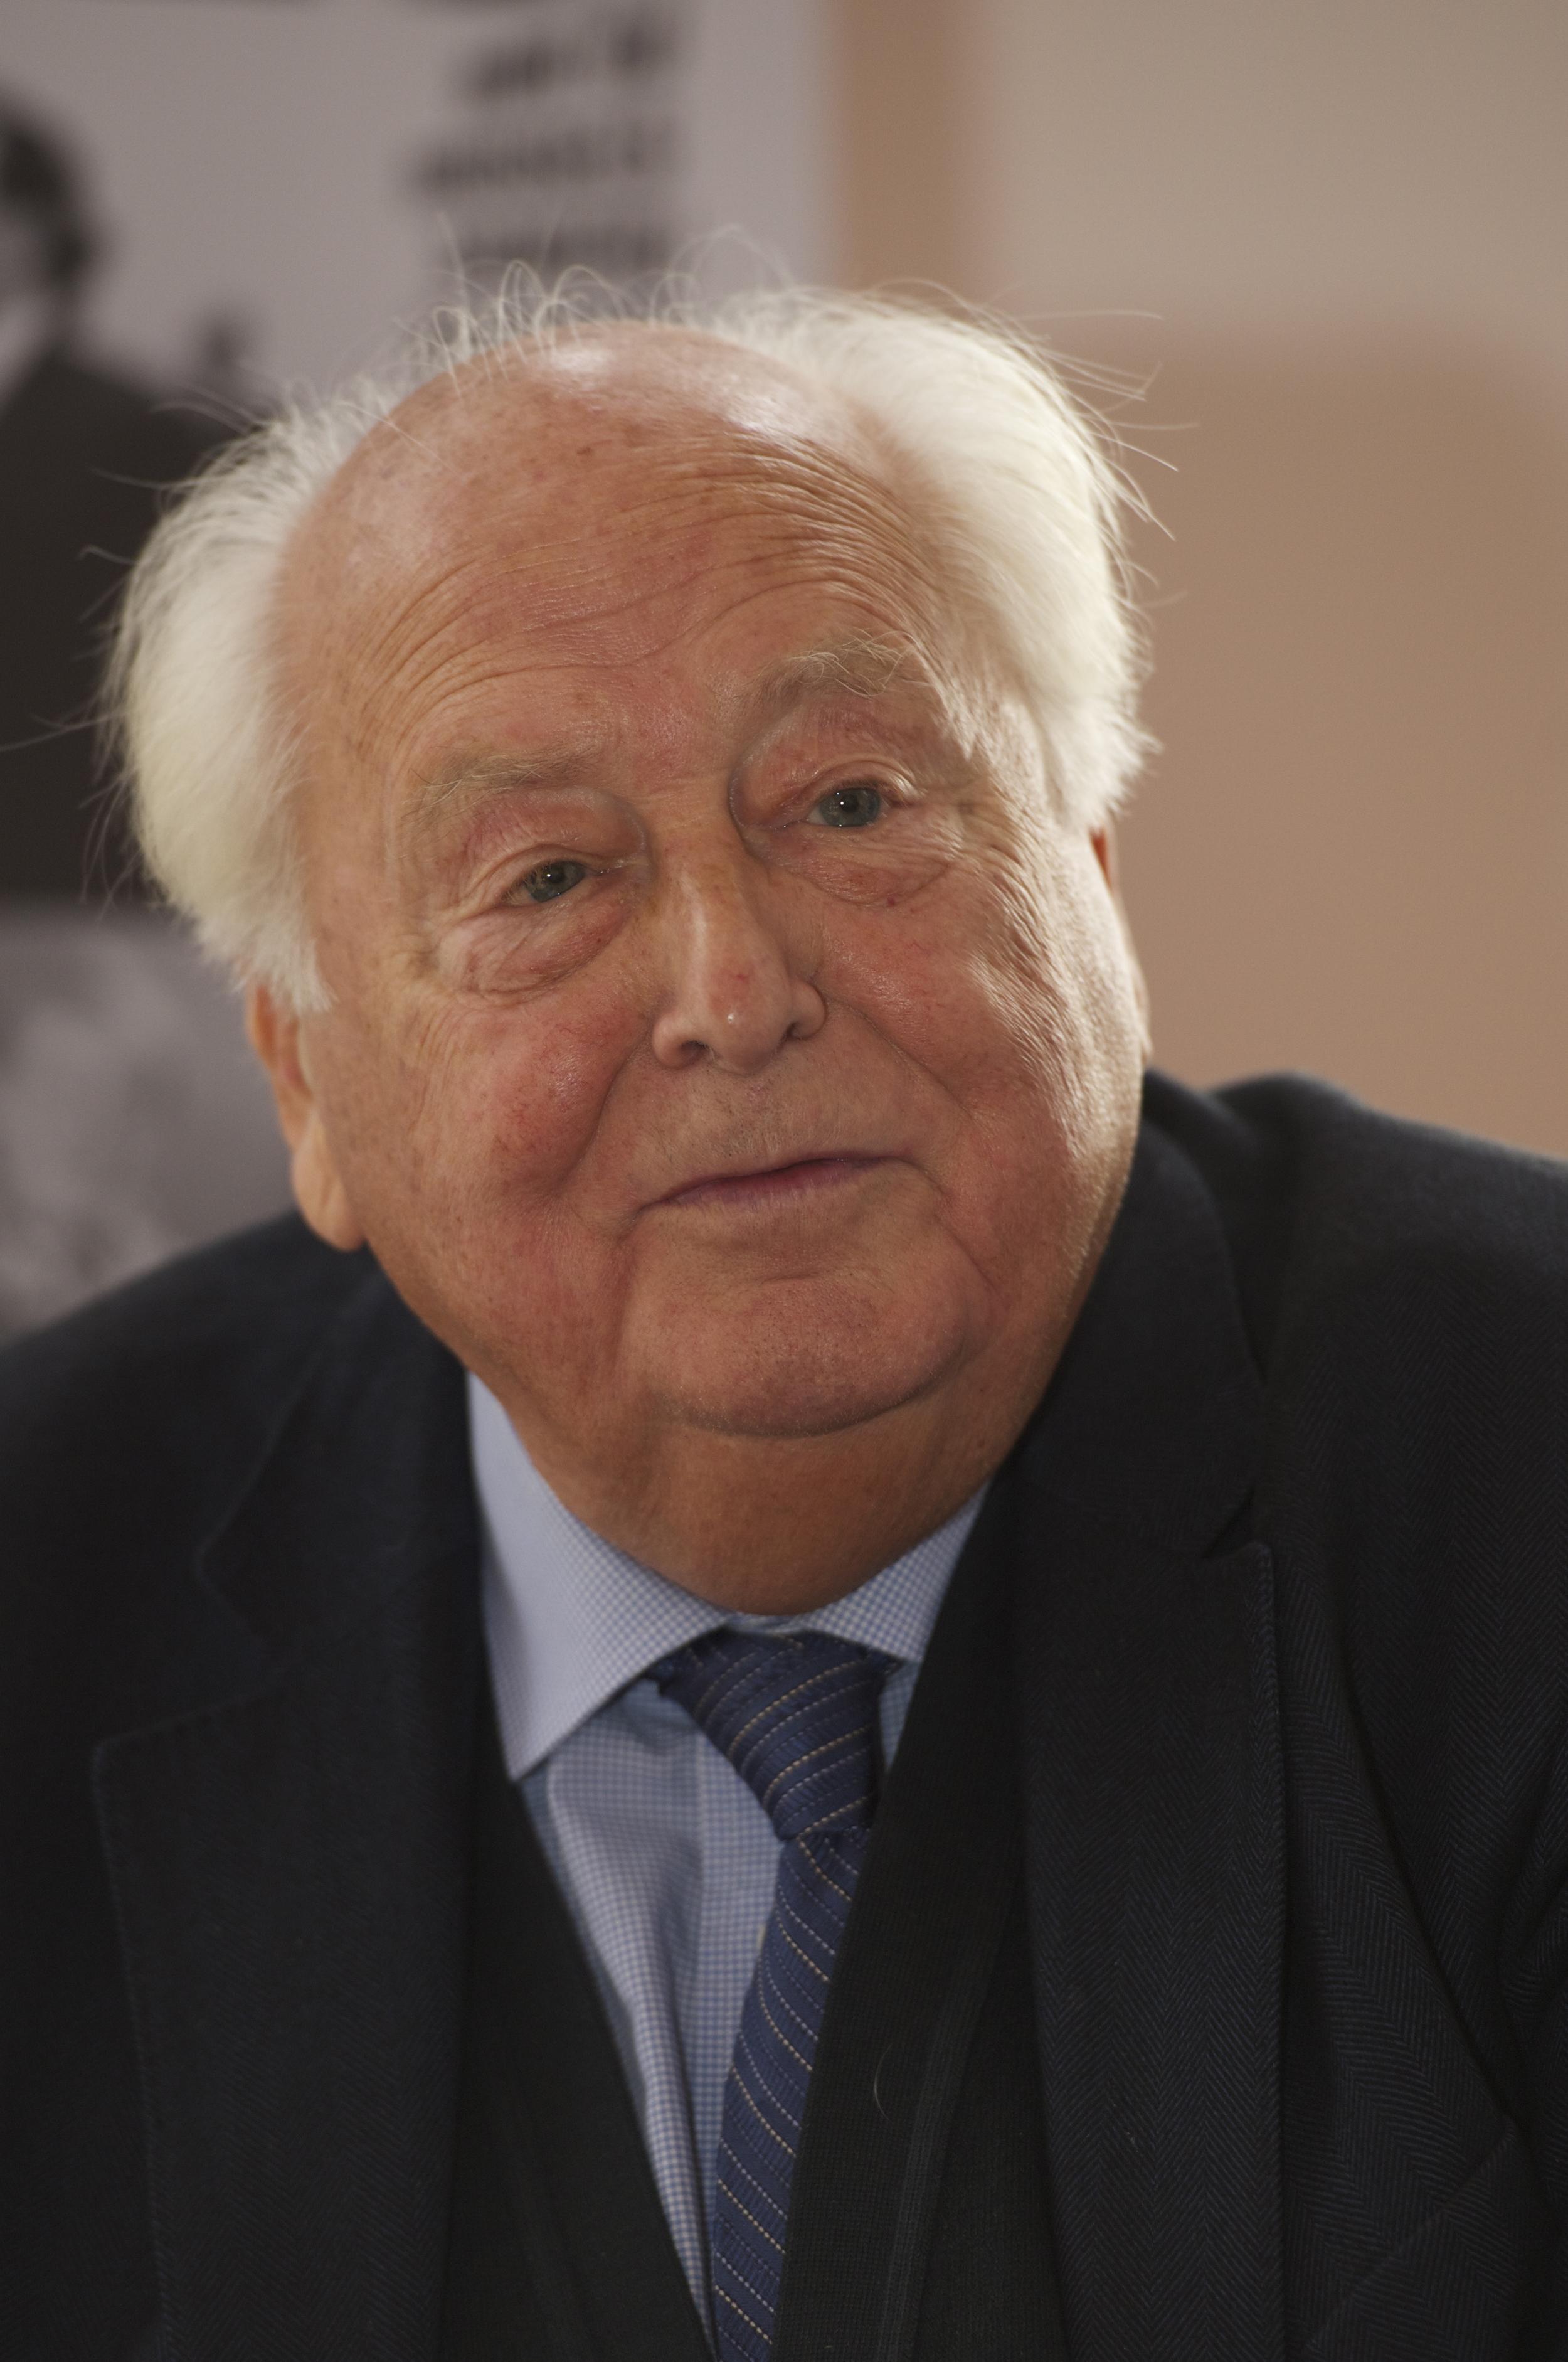 Raymond Georis at the Historic Speech debate at BOZAR.Photo ©Yves Gervais